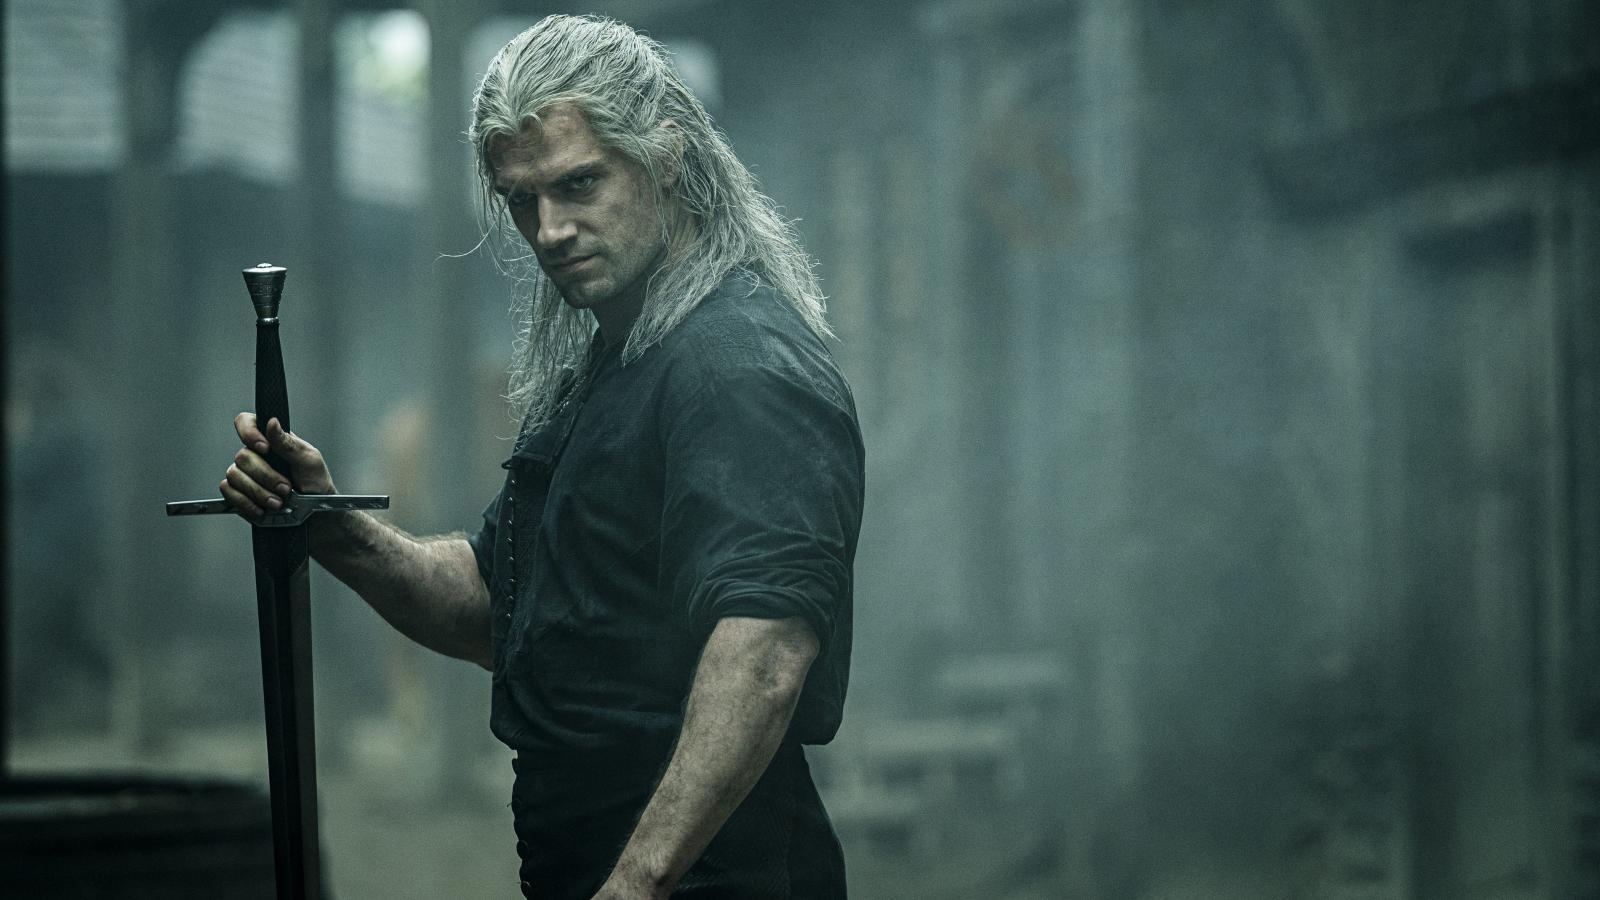 The Witcher - www.culturageek.com.ar